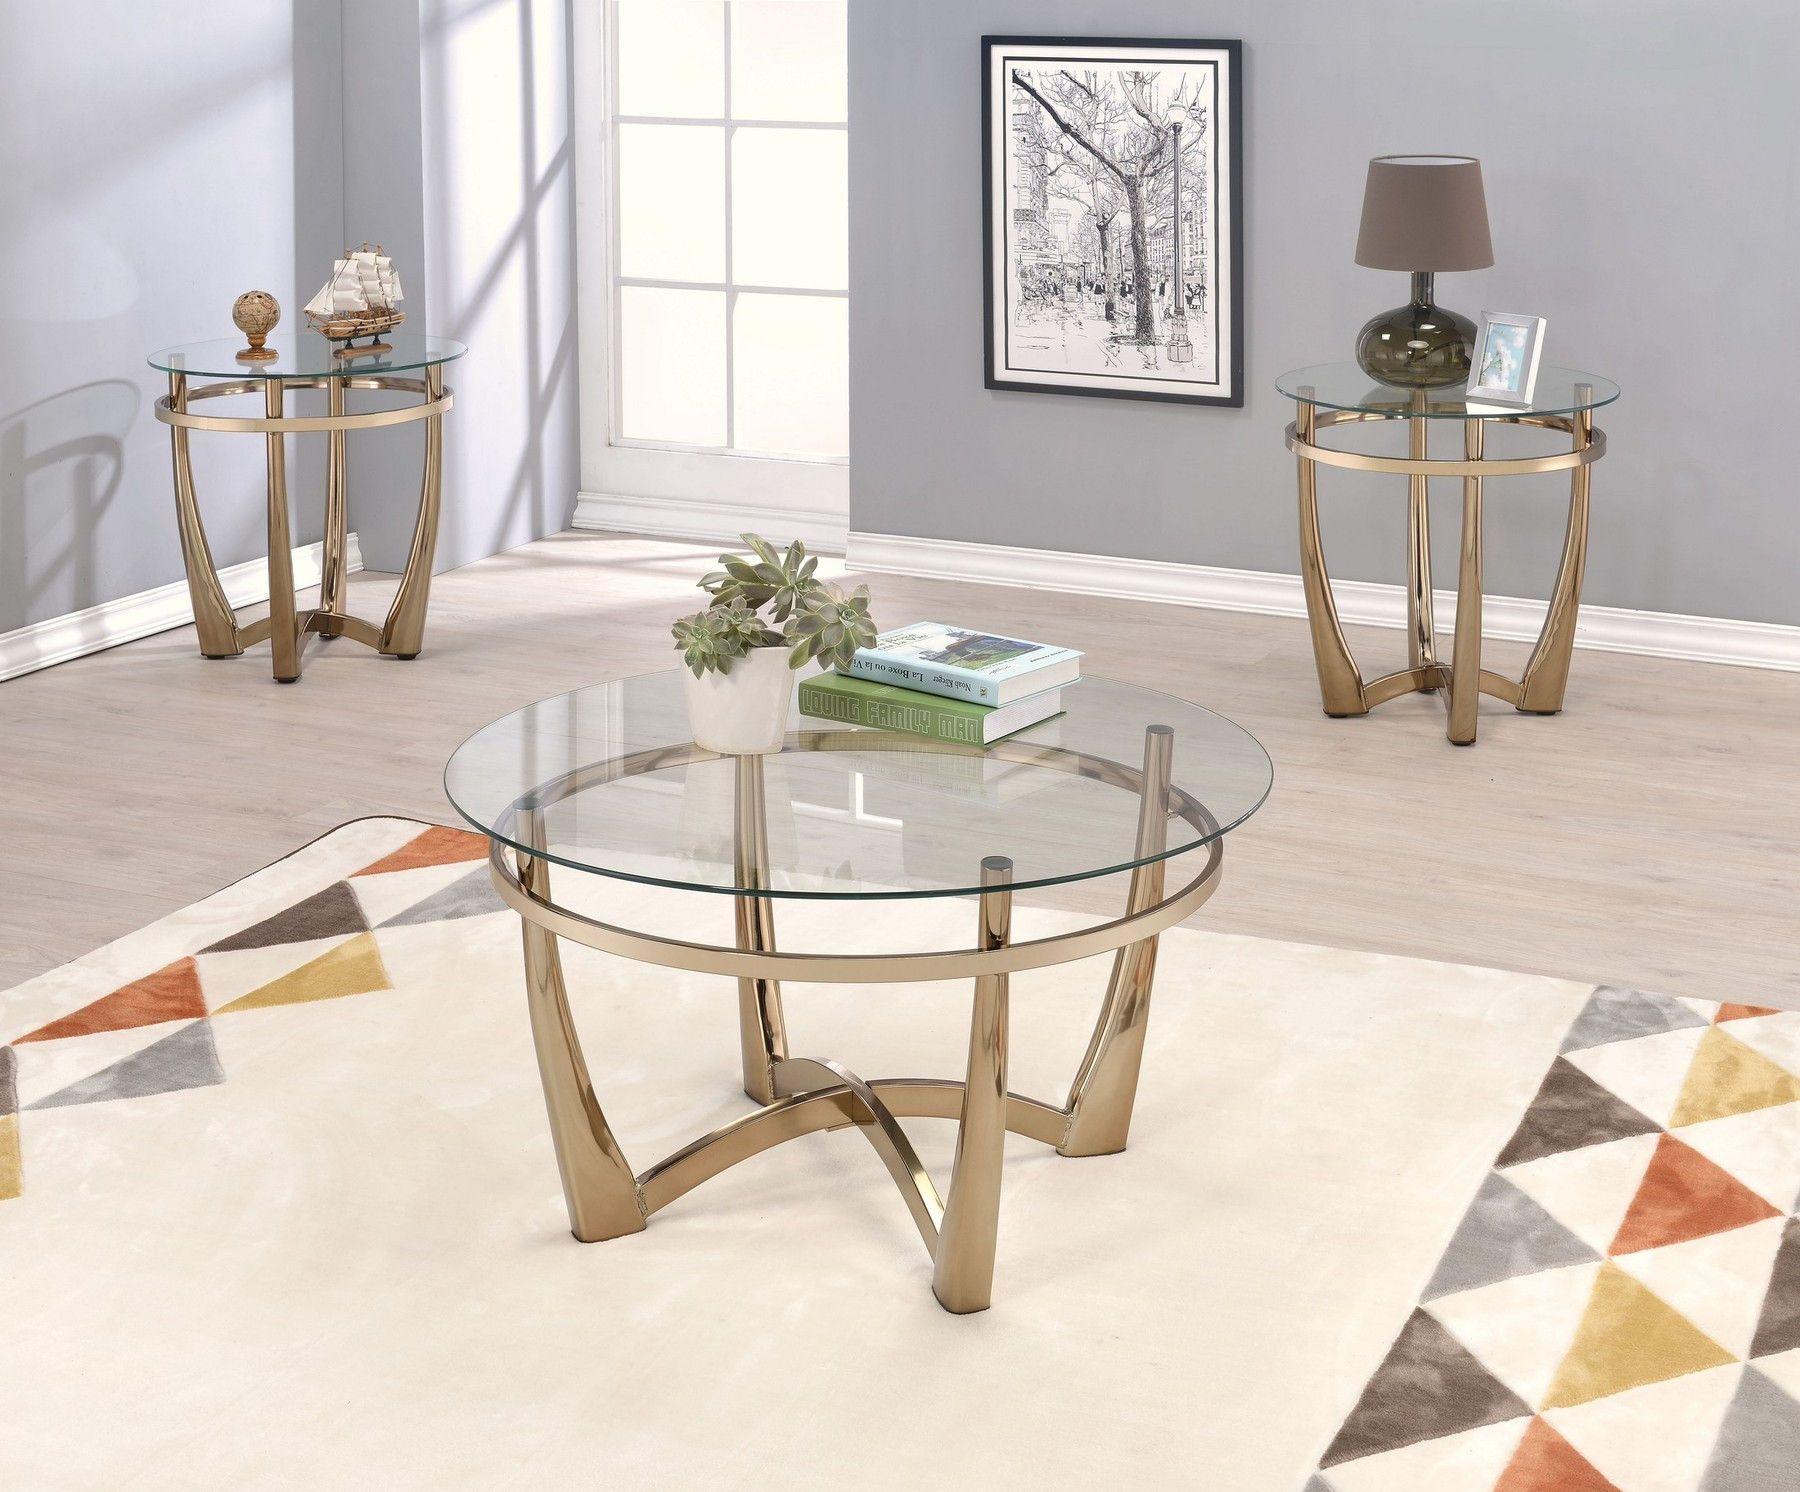 Orlando Ii Coffee Table 81610 Acme Corporation Coffee Tables In 2021 Coffee Table Coffee Table Setting Round Glass Coffee Table [ 1492 x 1800 Pixel ]